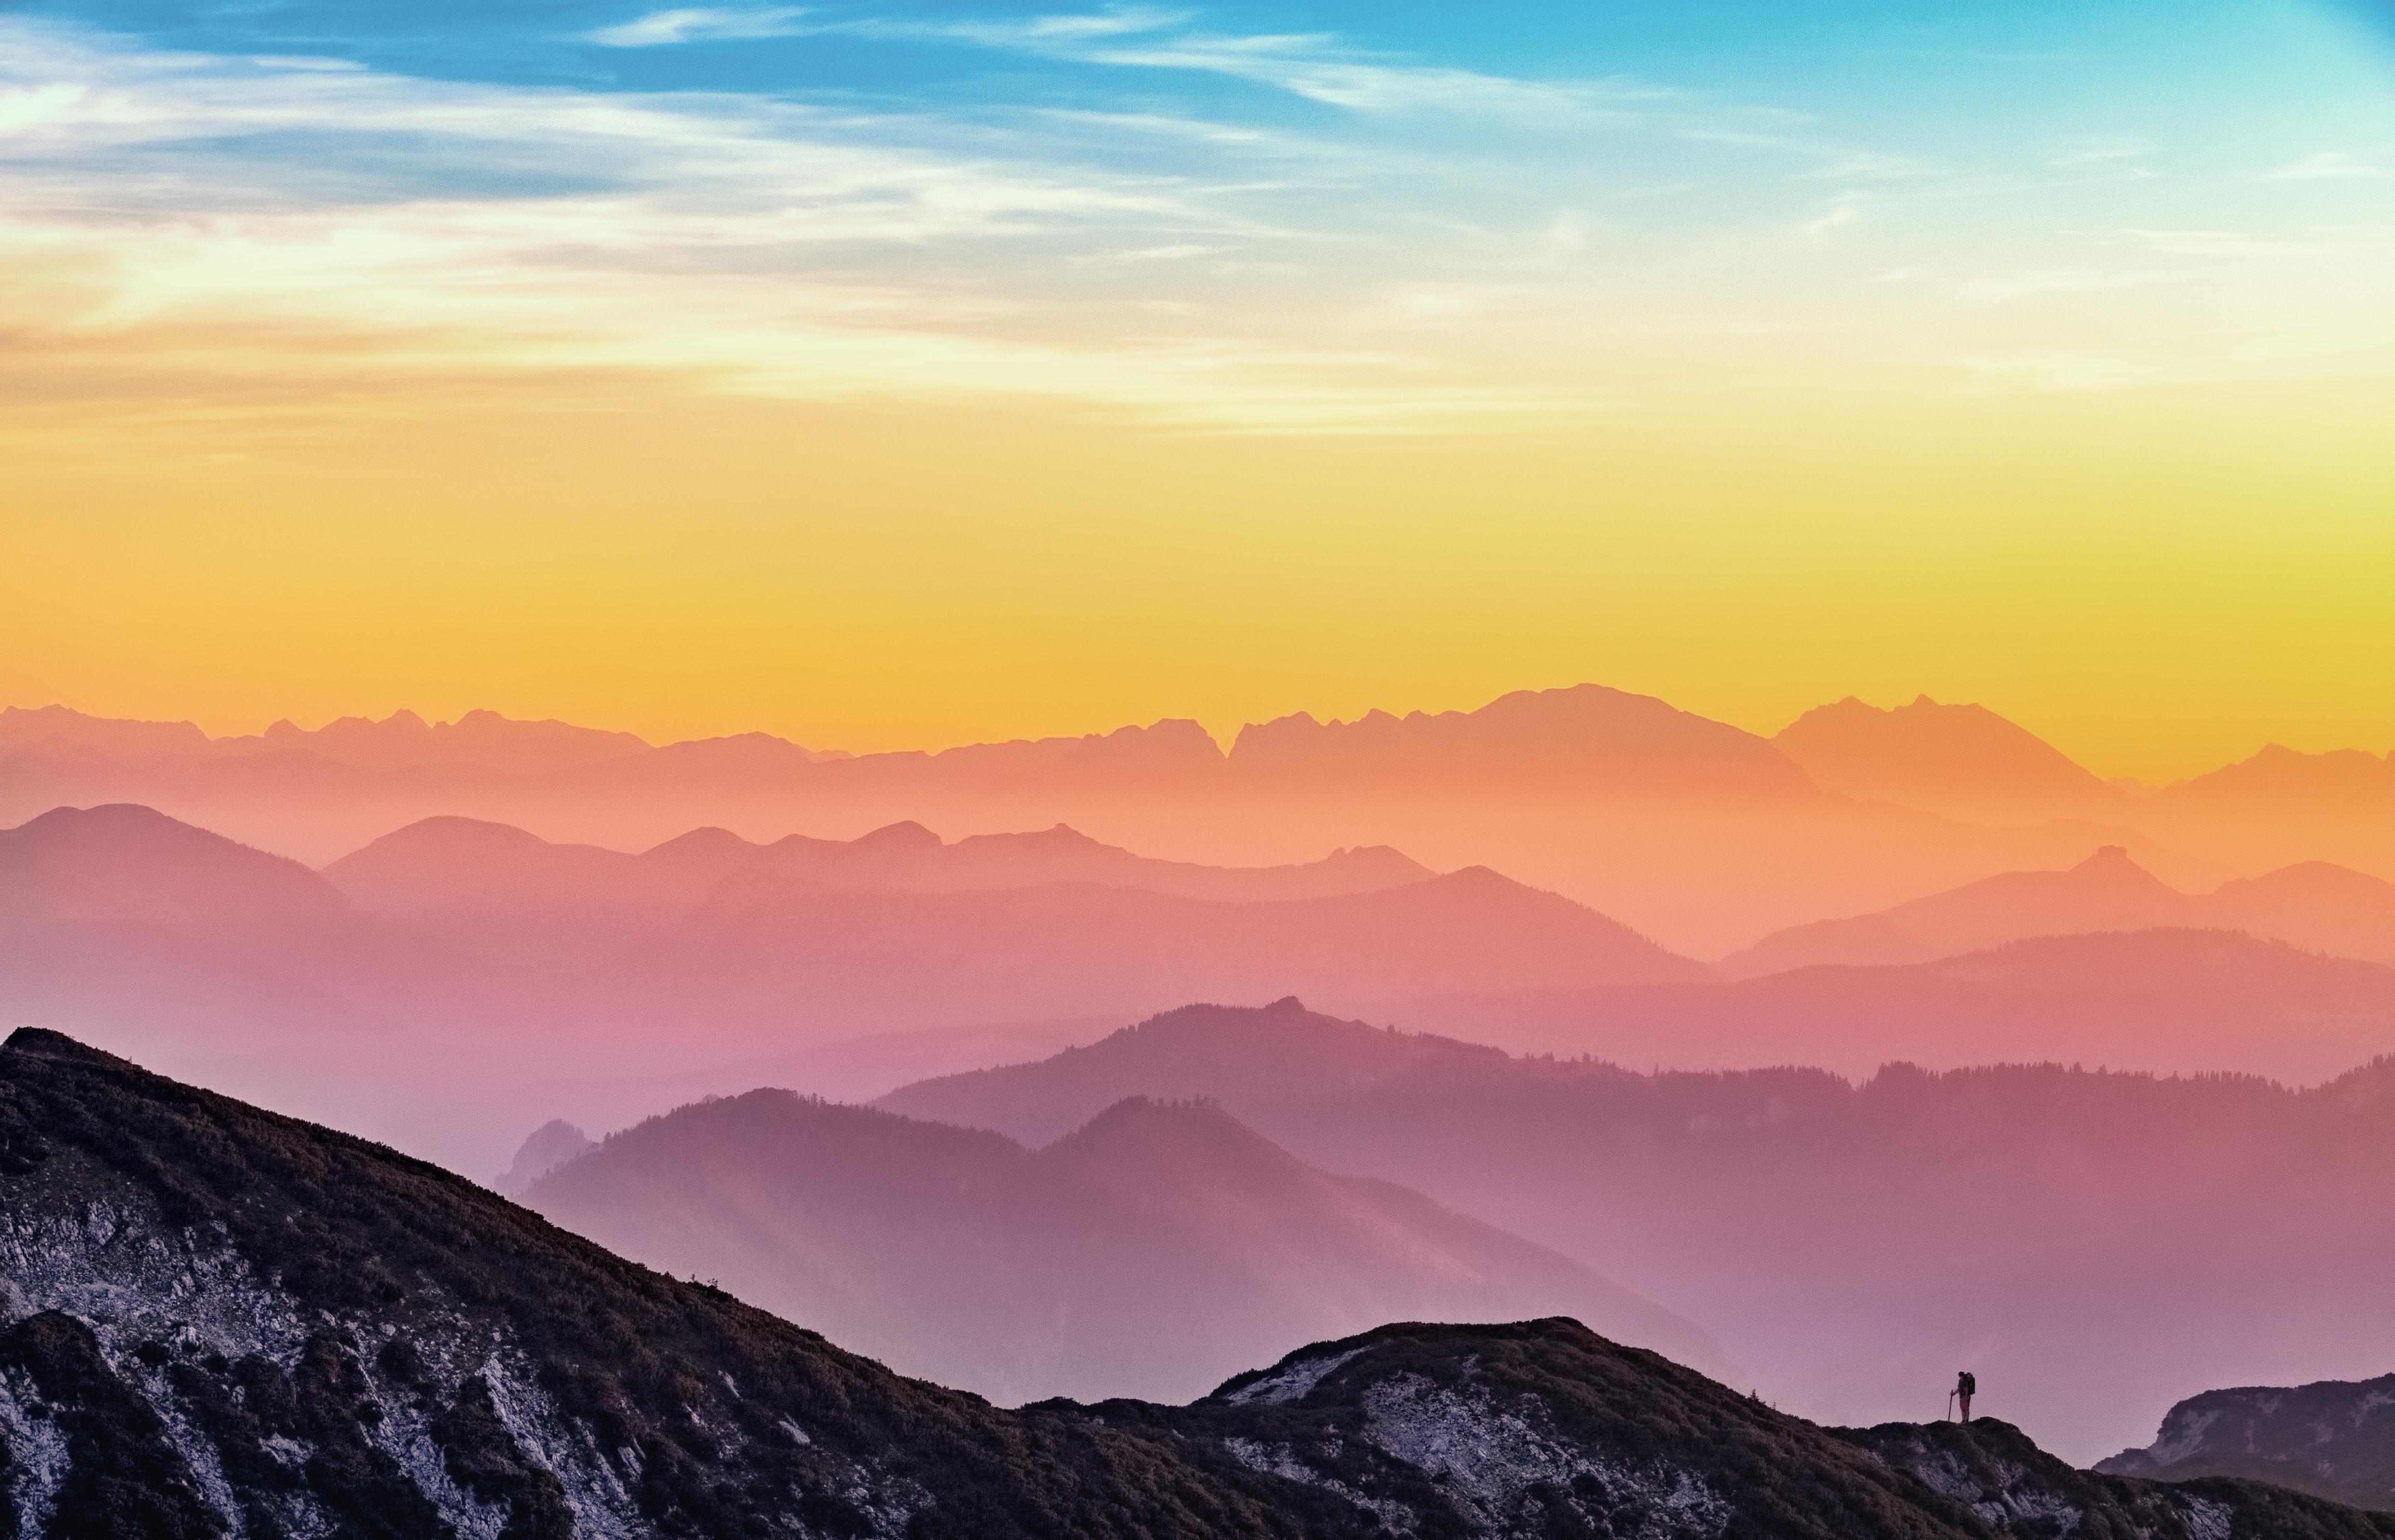 austria-dawn-desktop-backgrounds-1323550